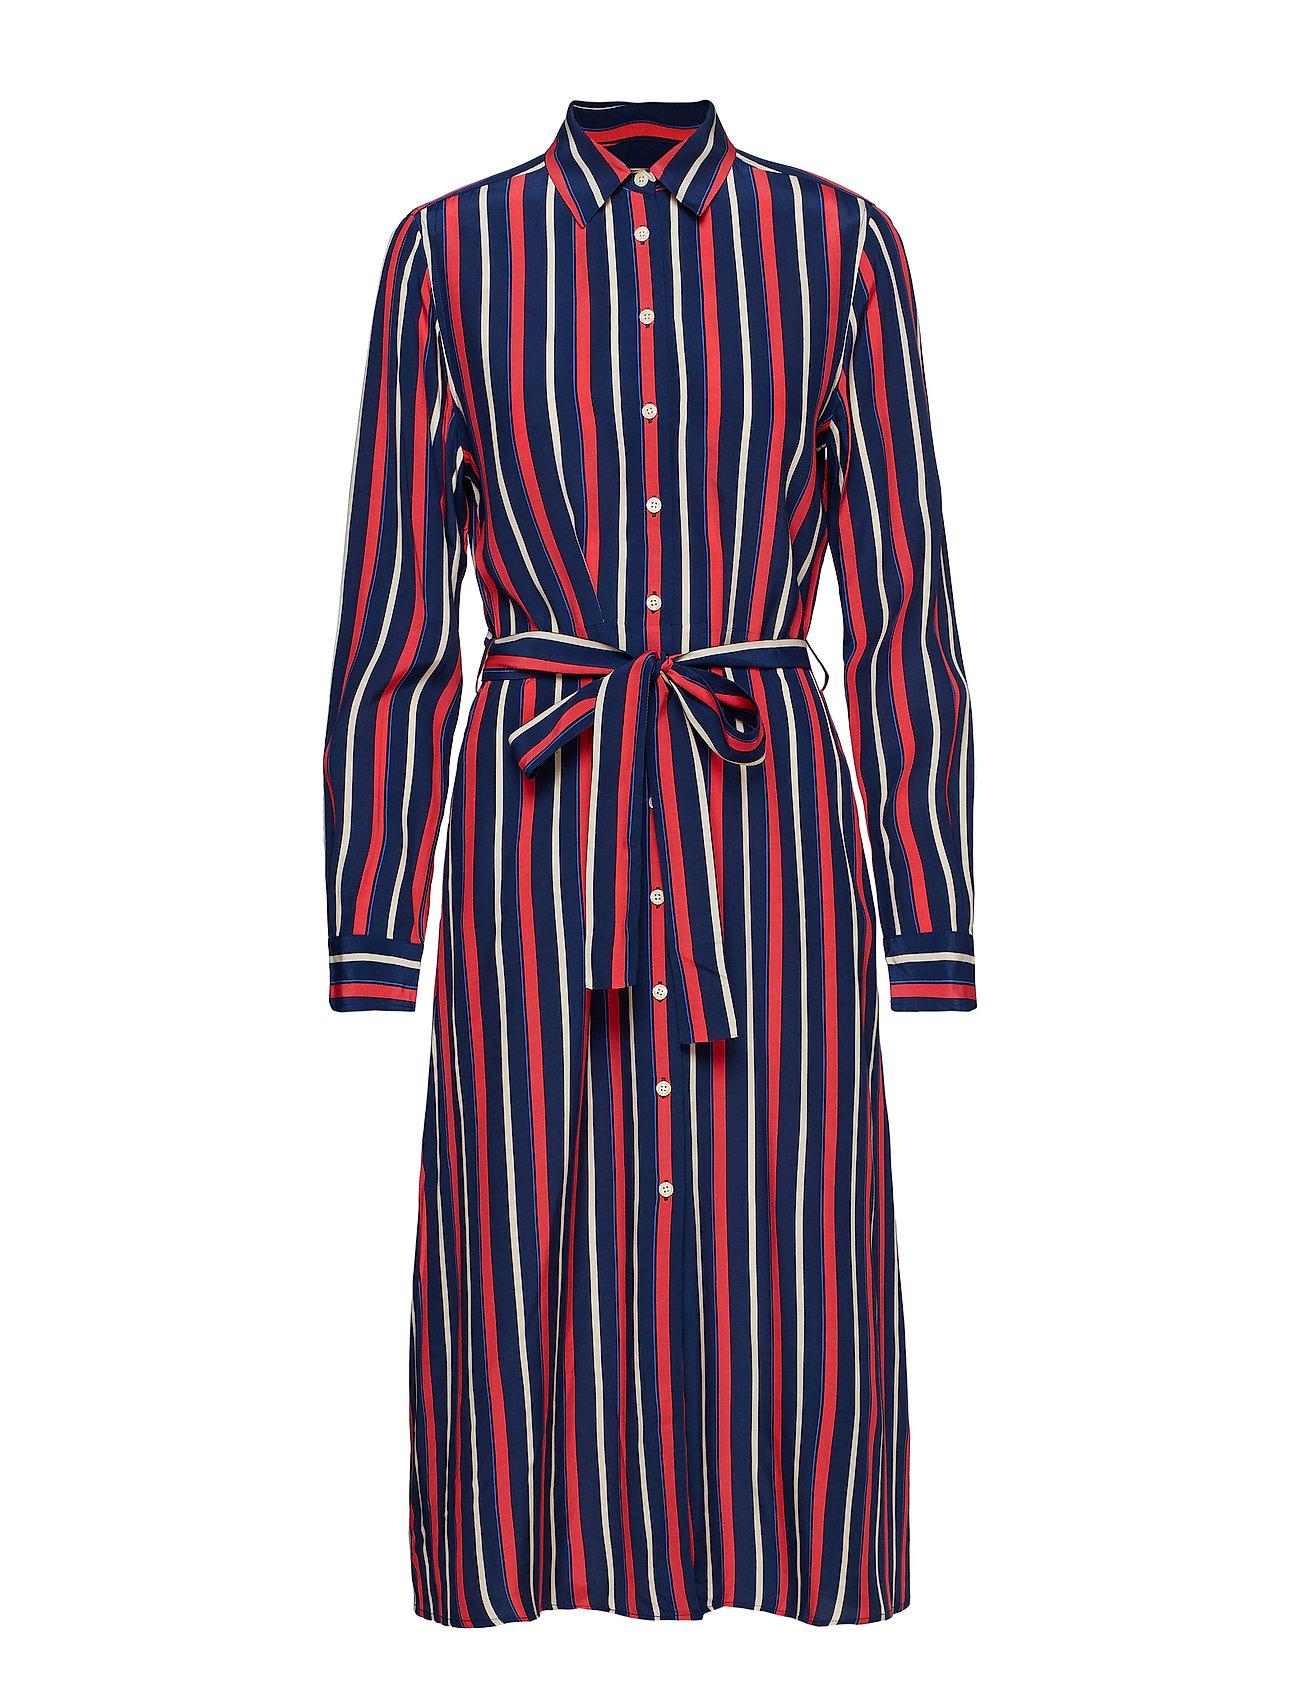 Dresspersian O1Fluid Striped Dresspersian O1Fluid BlueGant Striped BlueGant O1Fluid O1Fluid Dresspersian BlueGant Striped Ny0OvPm8nw